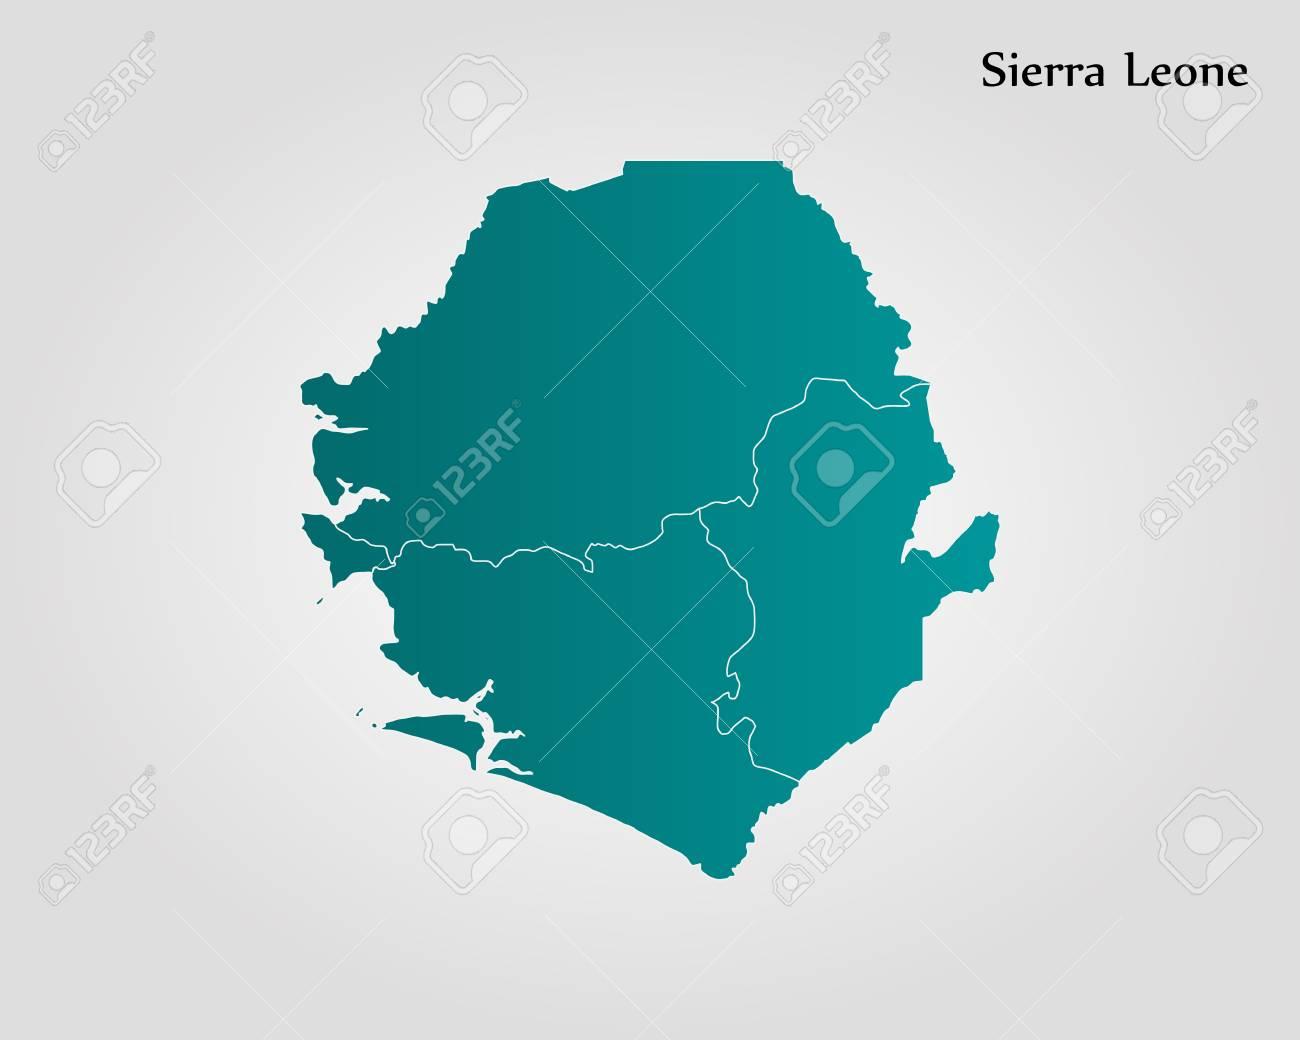 Map Of Sierra Leone Vector Illustration World Map Royalty Free